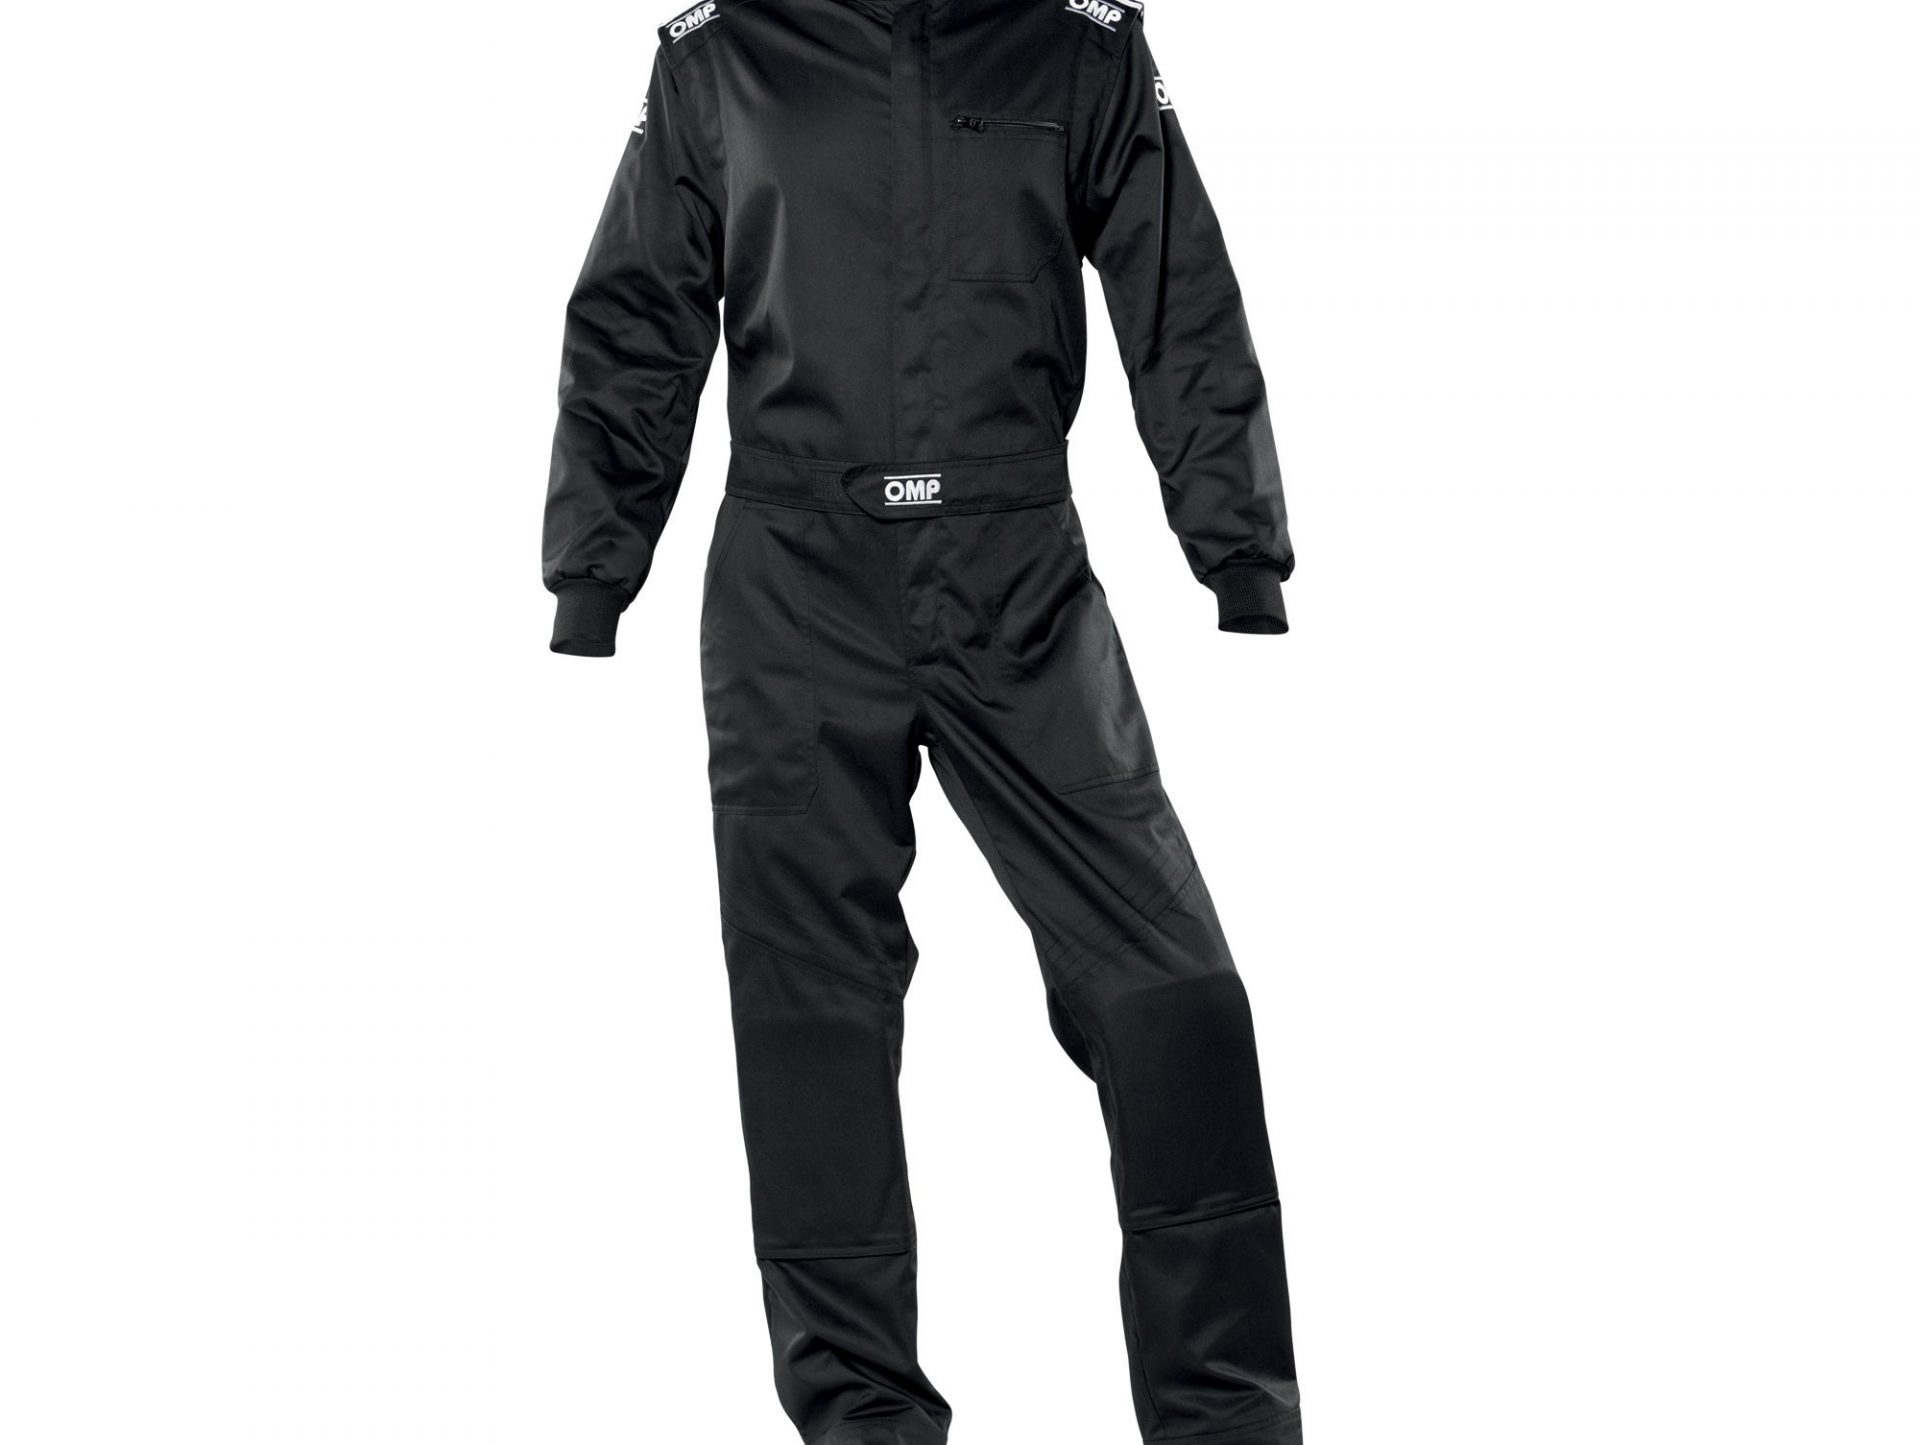 Нов продукт: OMP Blast Evo My 2021, Mechanics Suit